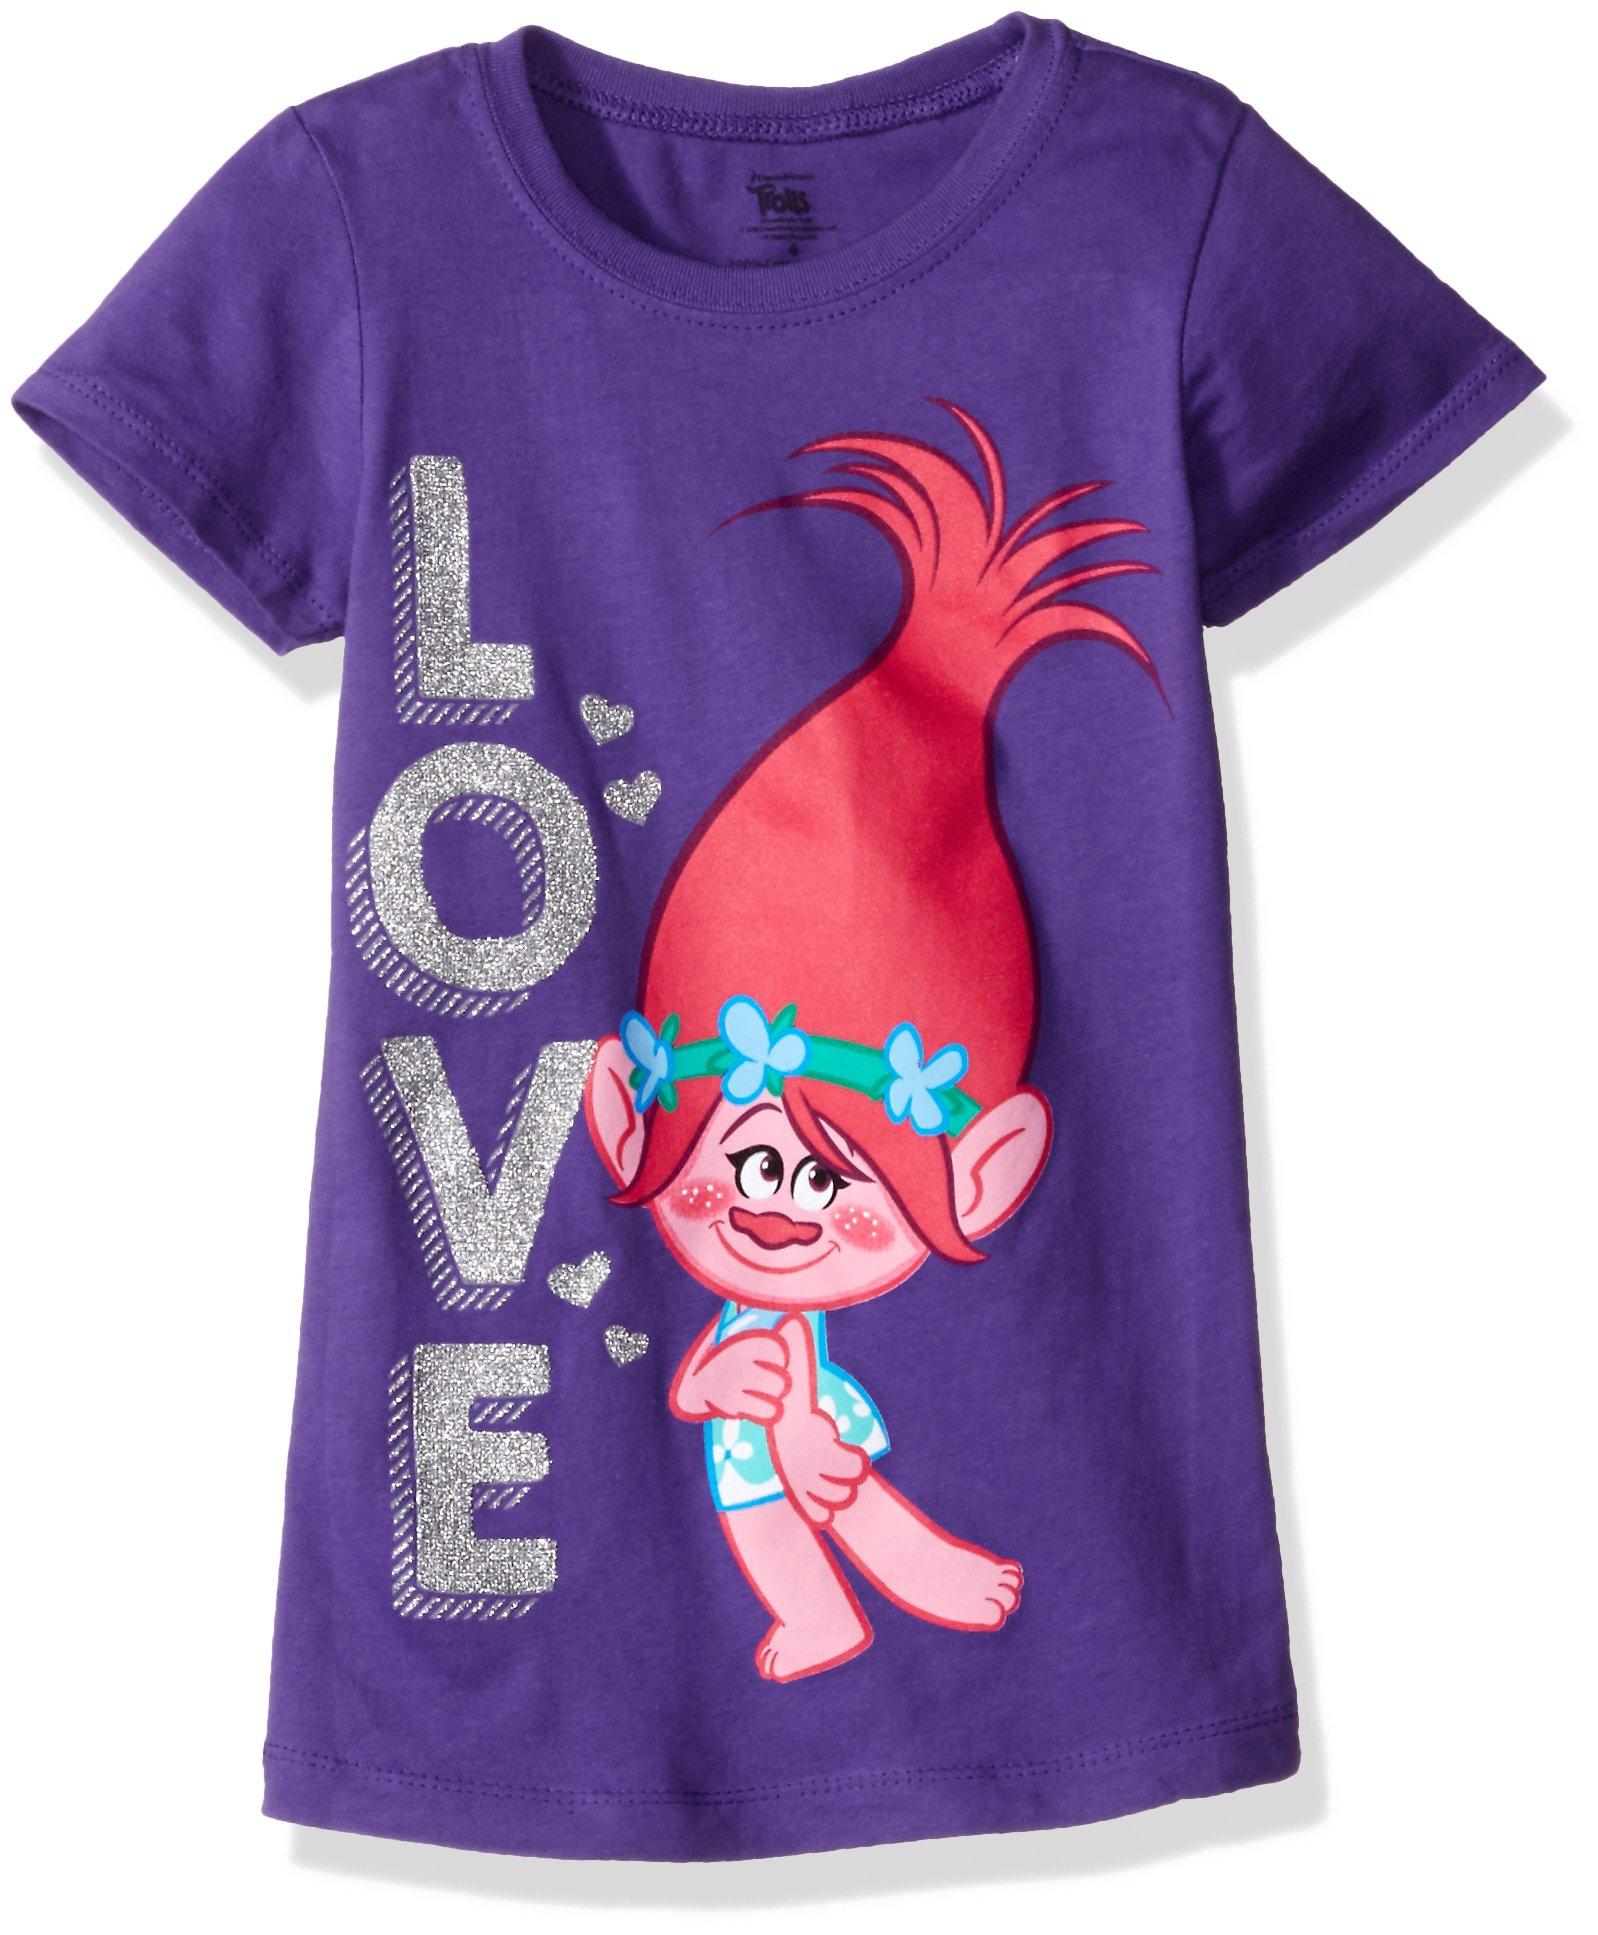 Trolls Girls' Little Girls' Love The Princess T-Shirt, Purple Rush, 4